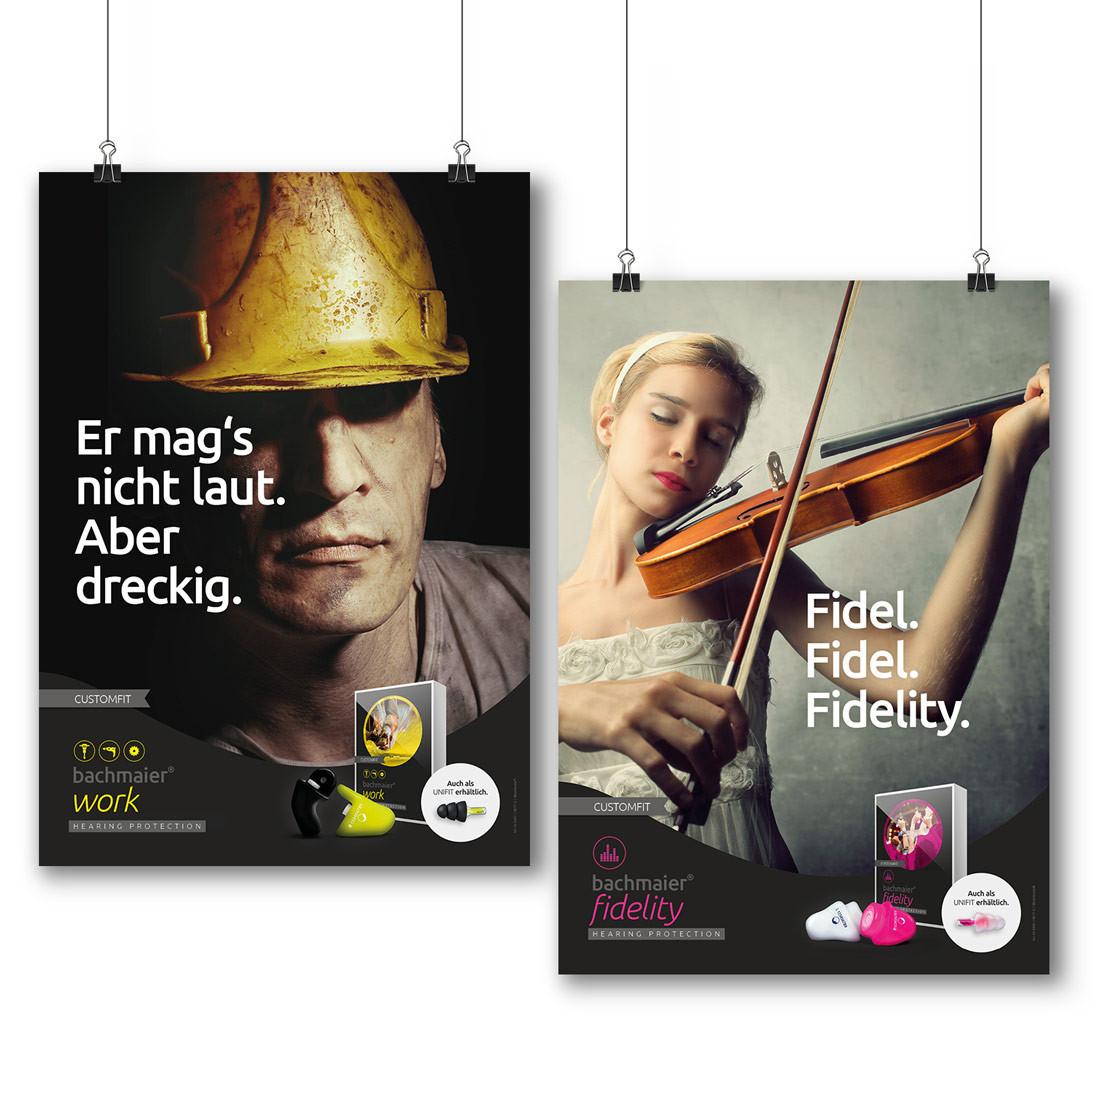 Poster CUSTOMFIT work/fidelity